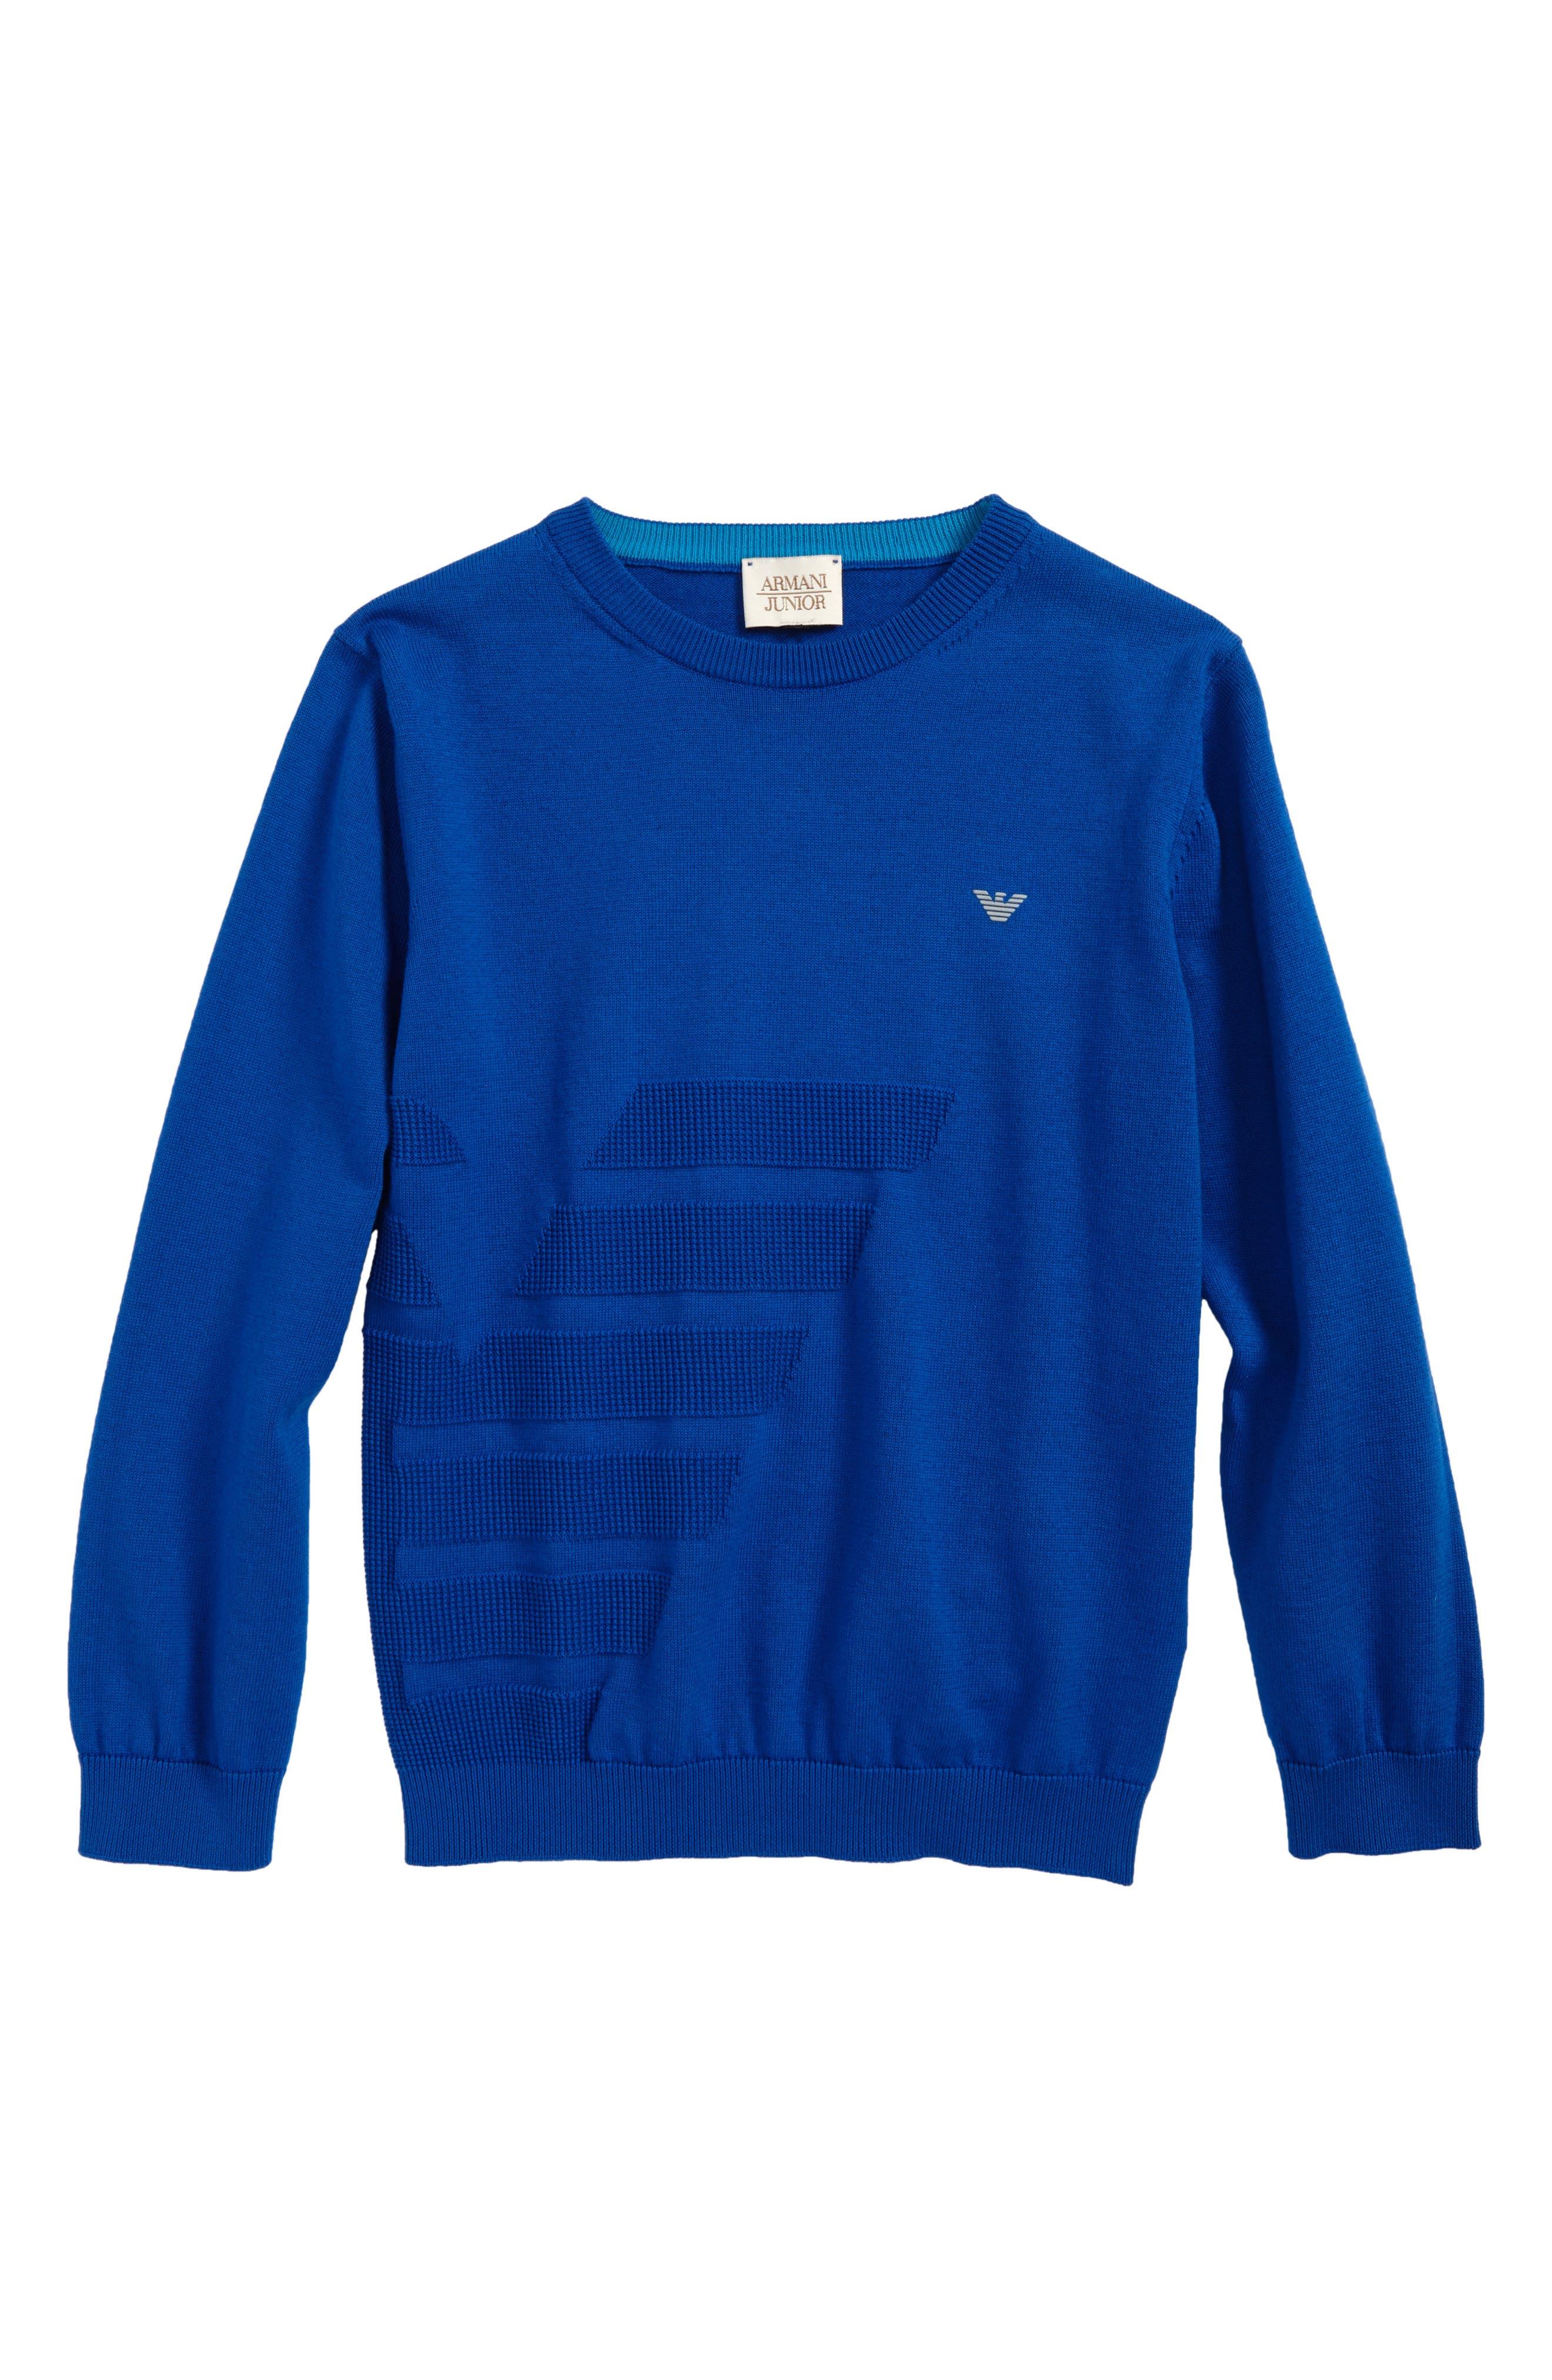 Logo Sweater,                         Main,                         color, Royal Blue